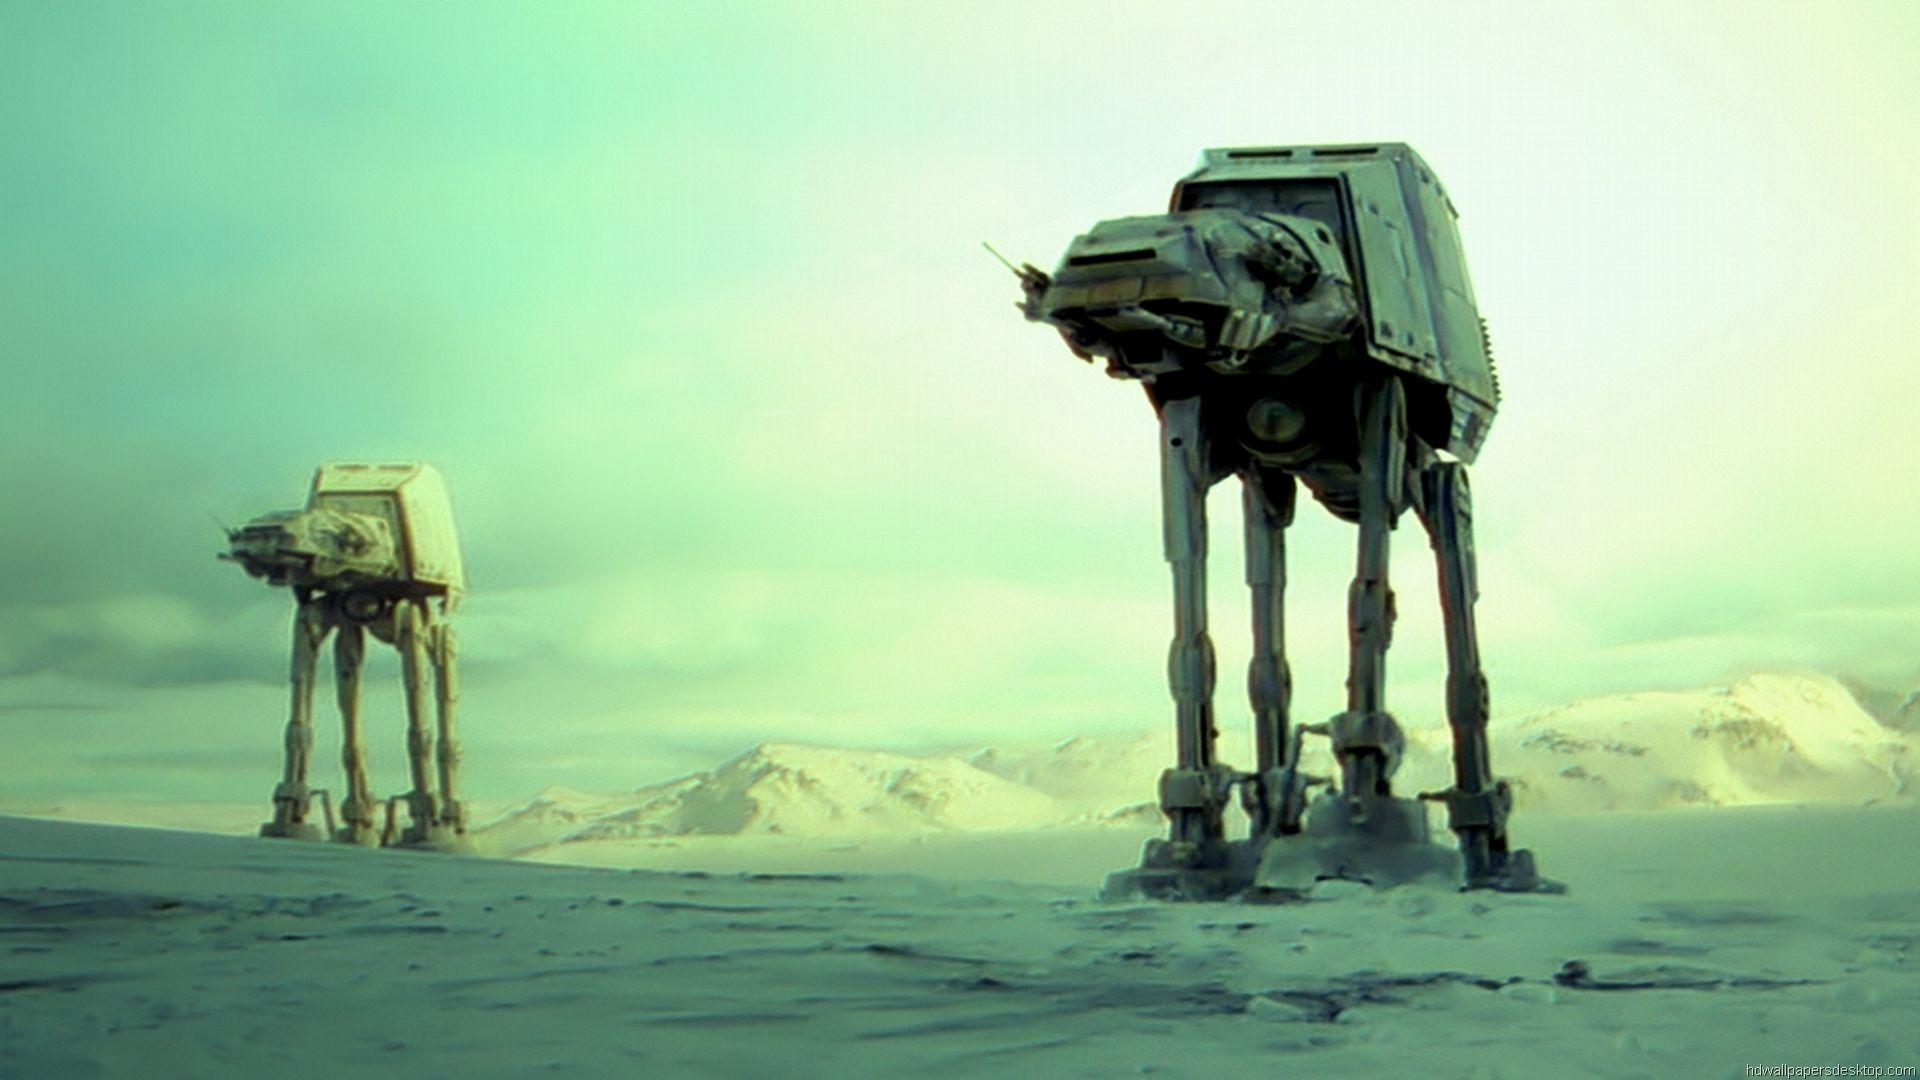 Star Wars Wallpapers 1080p - Wallpaper Cave